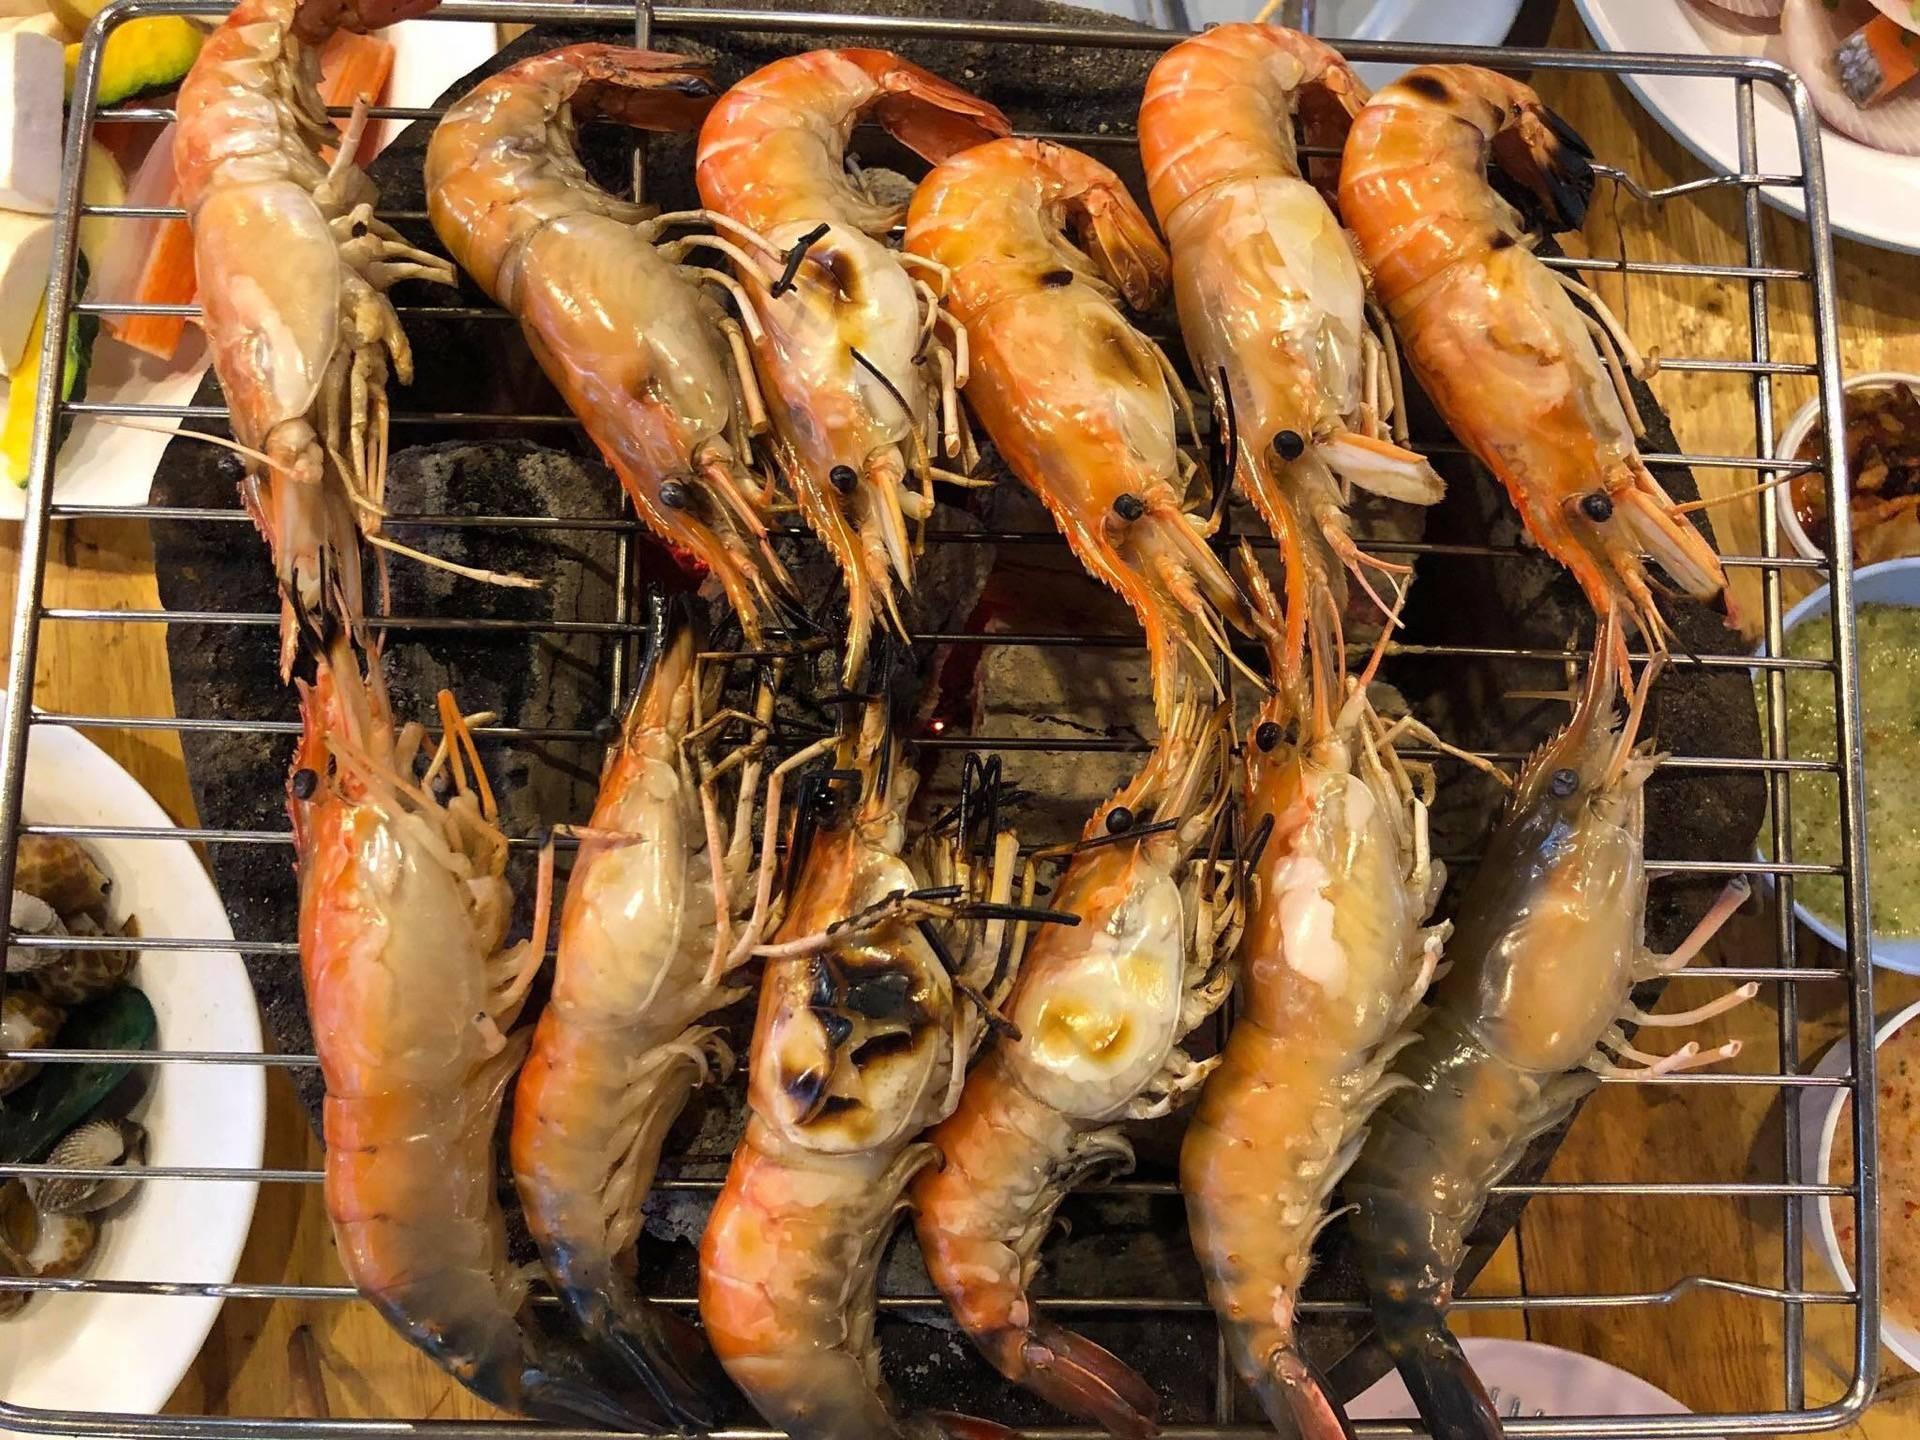 8/8 Seafood บุฟเฟ่ต์ทะเลเผา